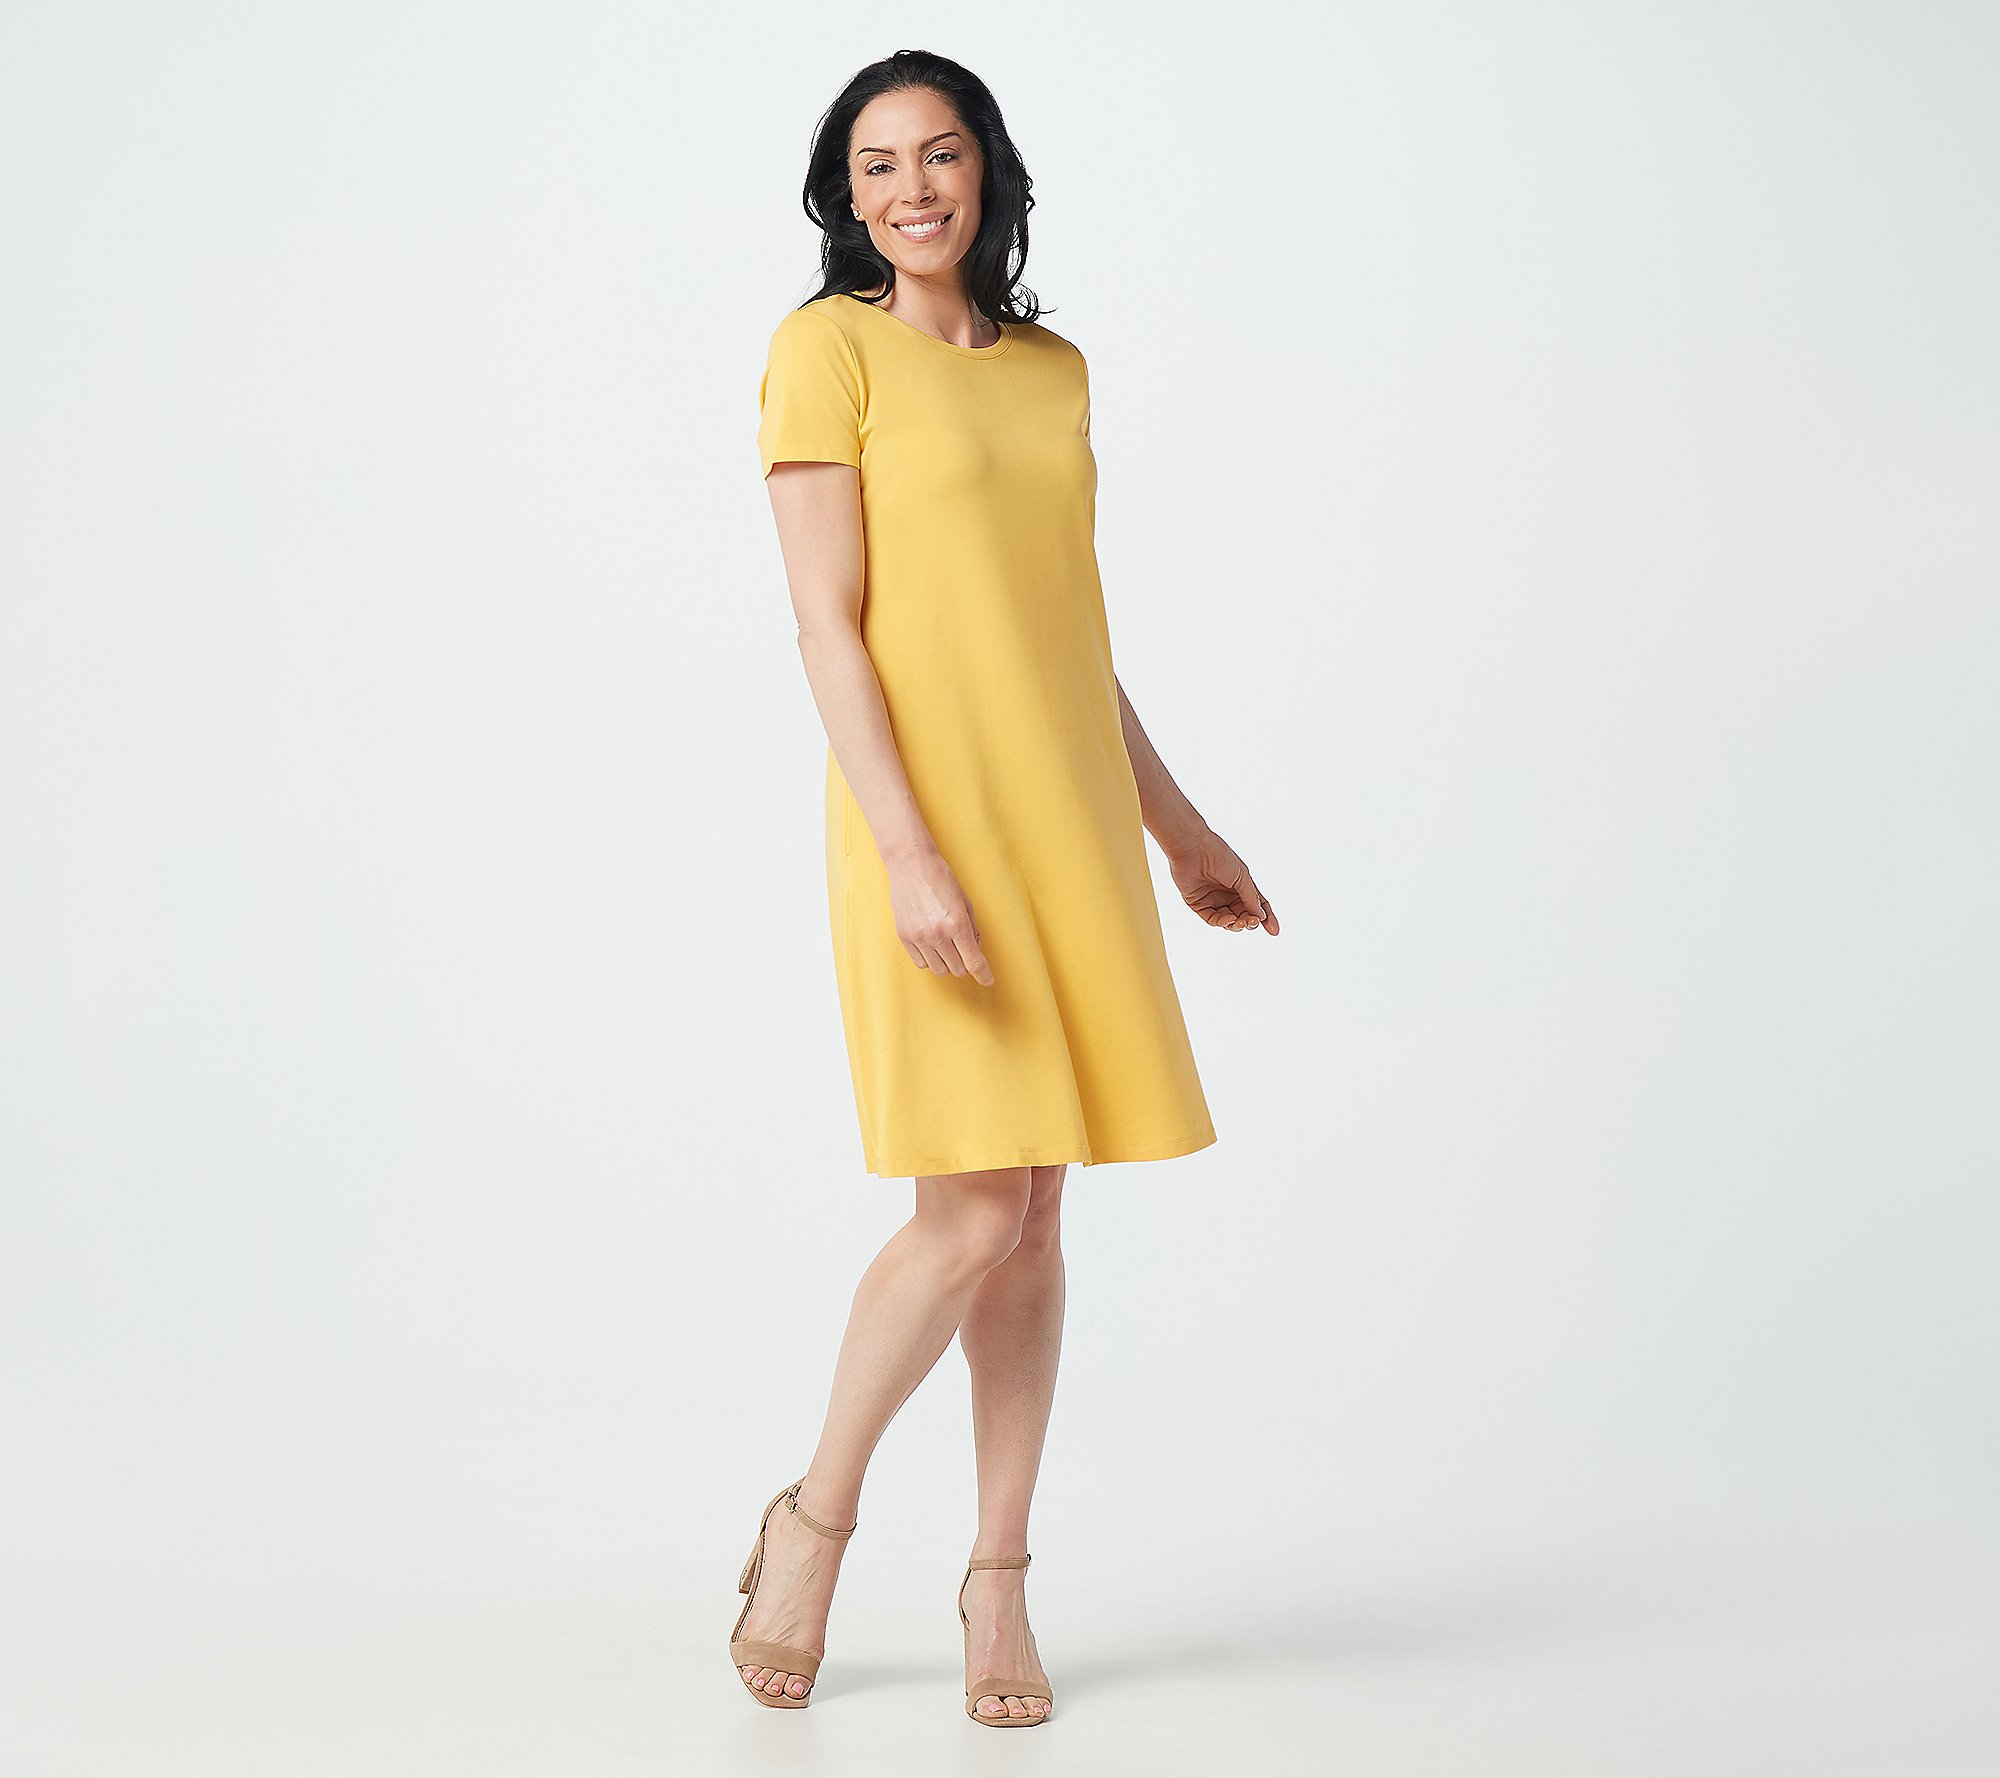 Womens Printing Dress Fashion Temperament High Waist Turn-down Collar 123 Spring